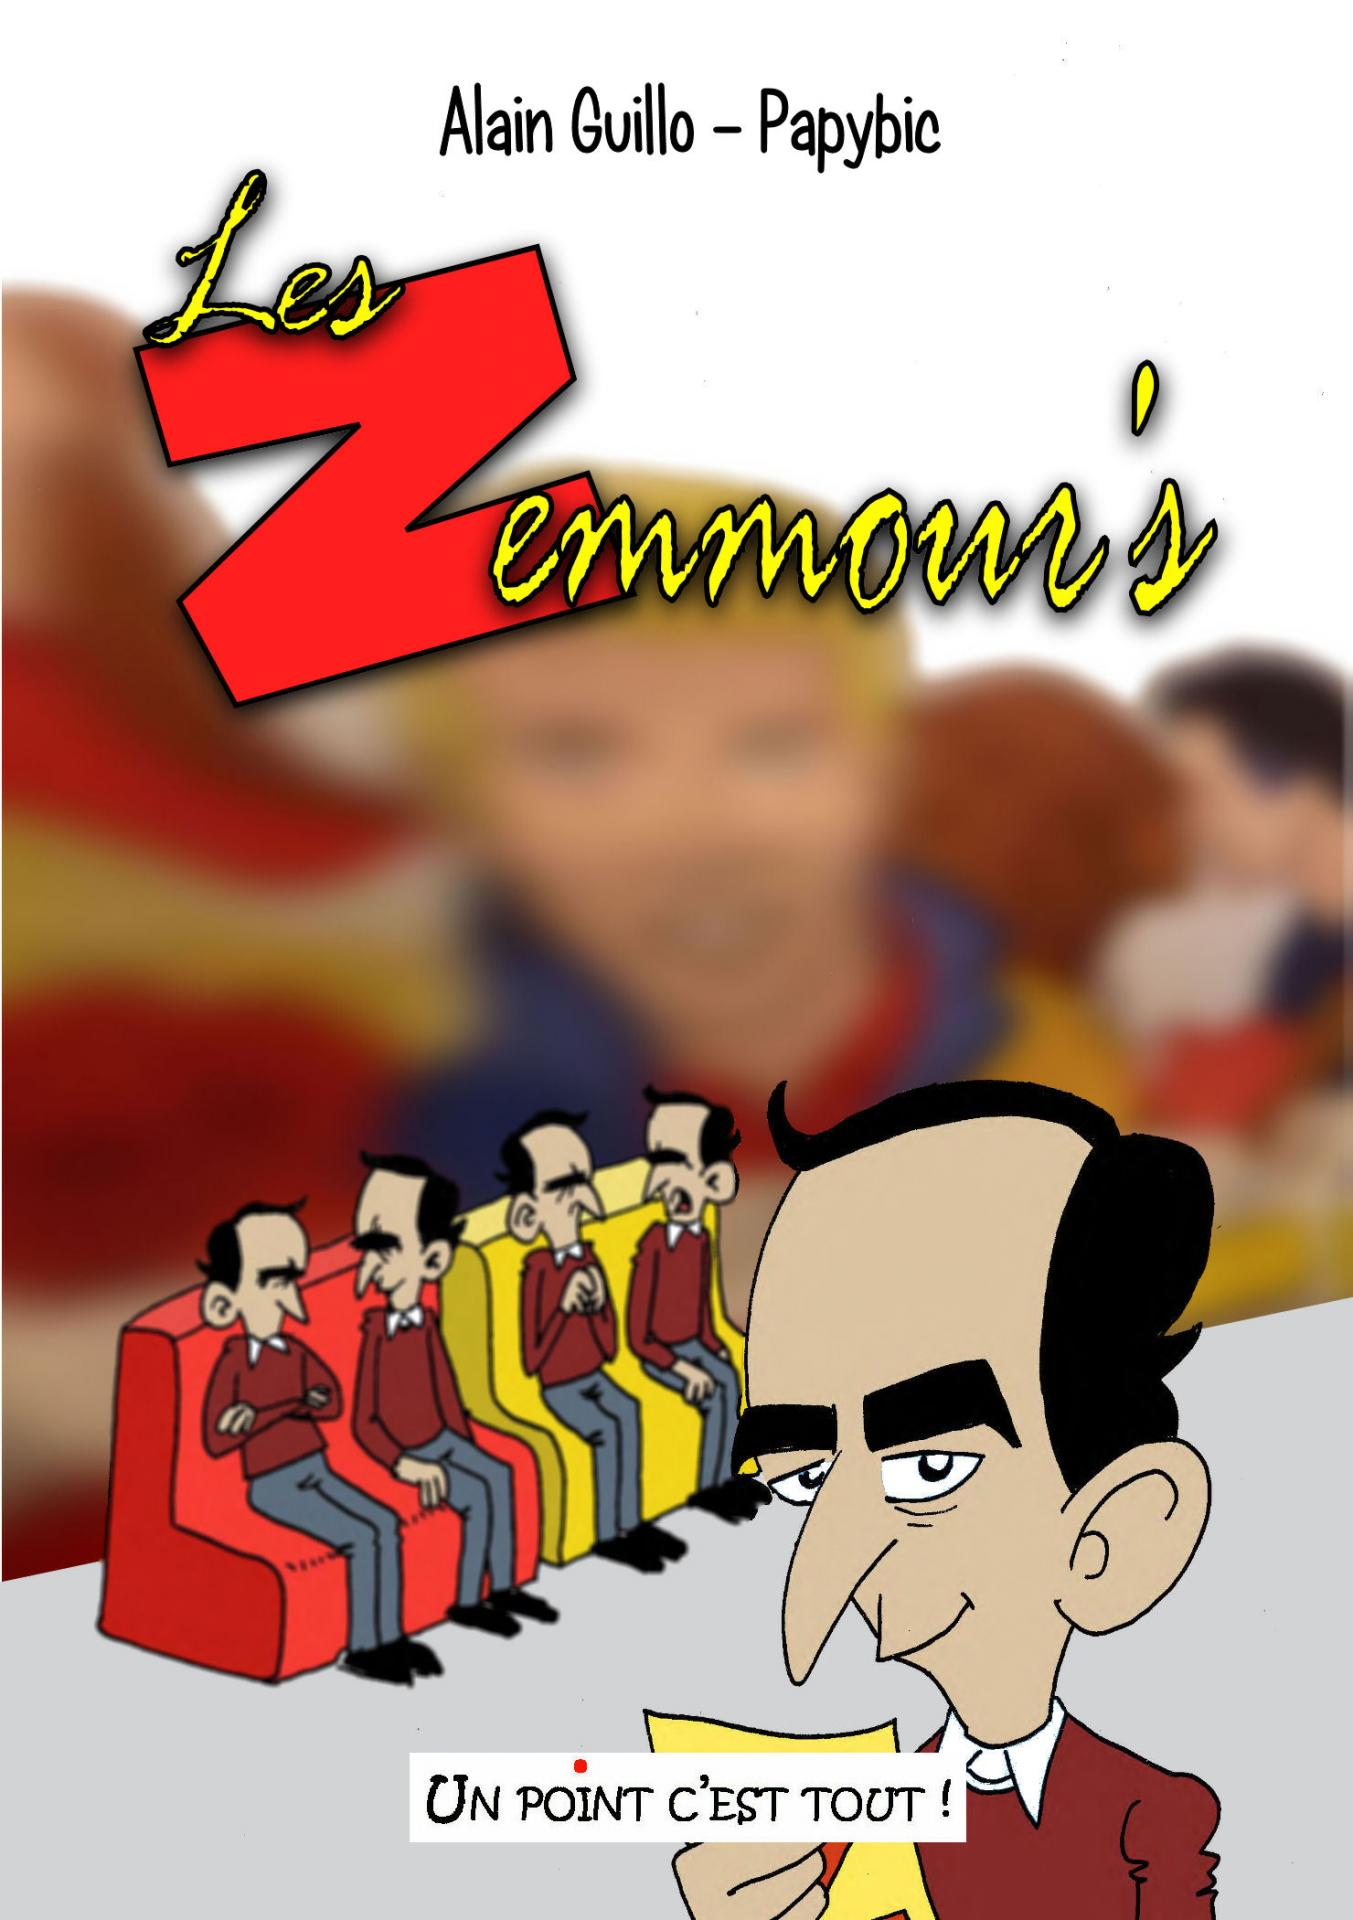 Les zemmourcouv